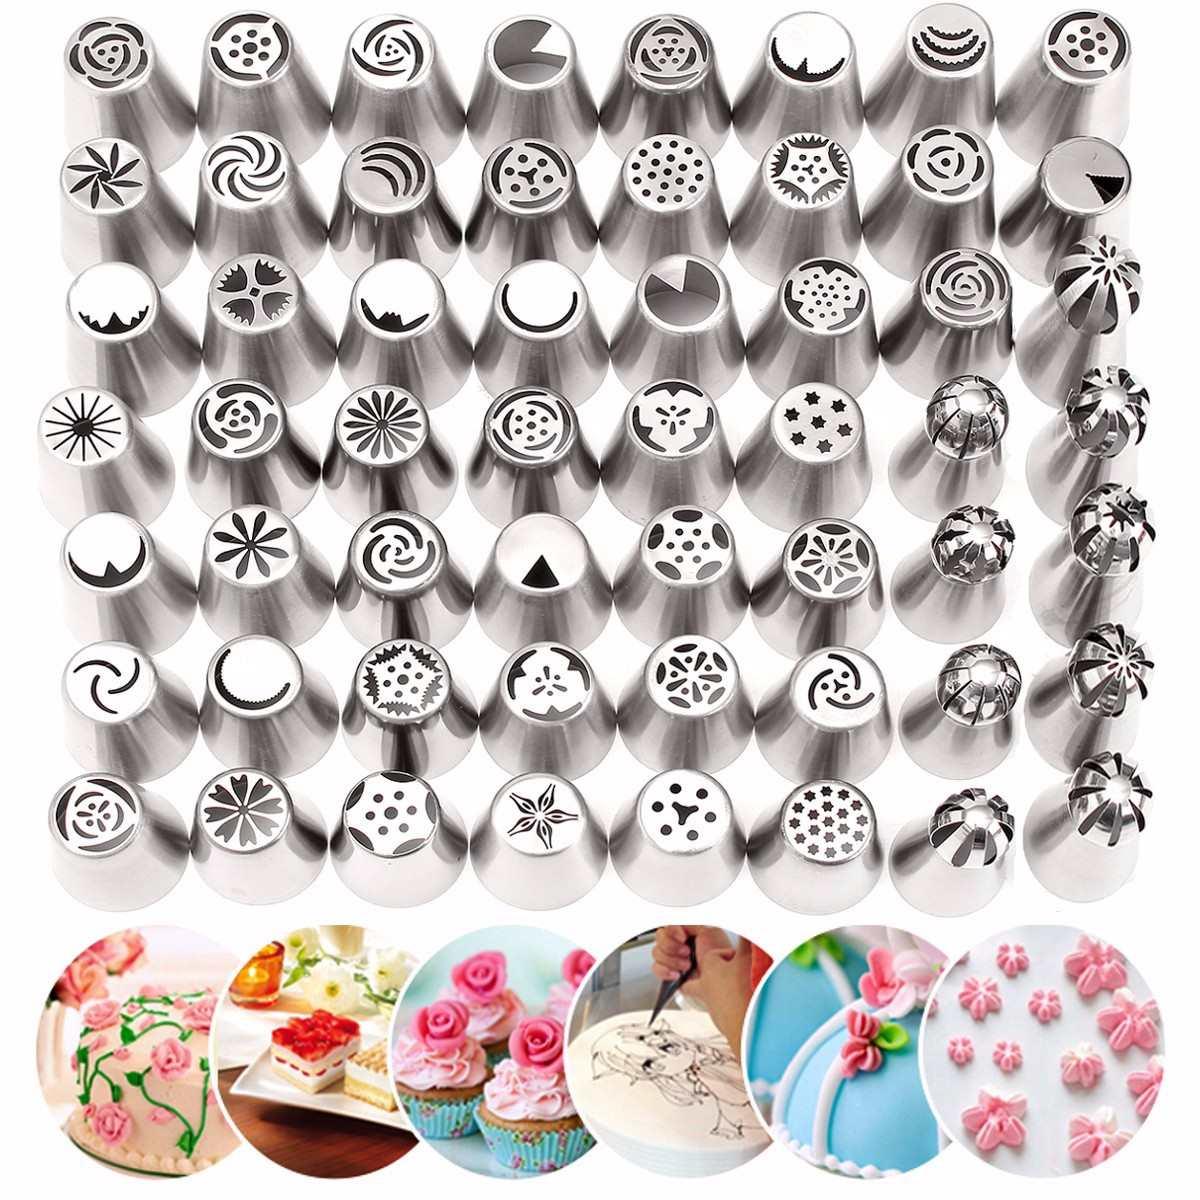 56pcs Tulip Flower Icing Piping Nozzles Set Russian Nozzles Pastry Cupcake Baking Decorating Tools Kit Cake Decorating Tips